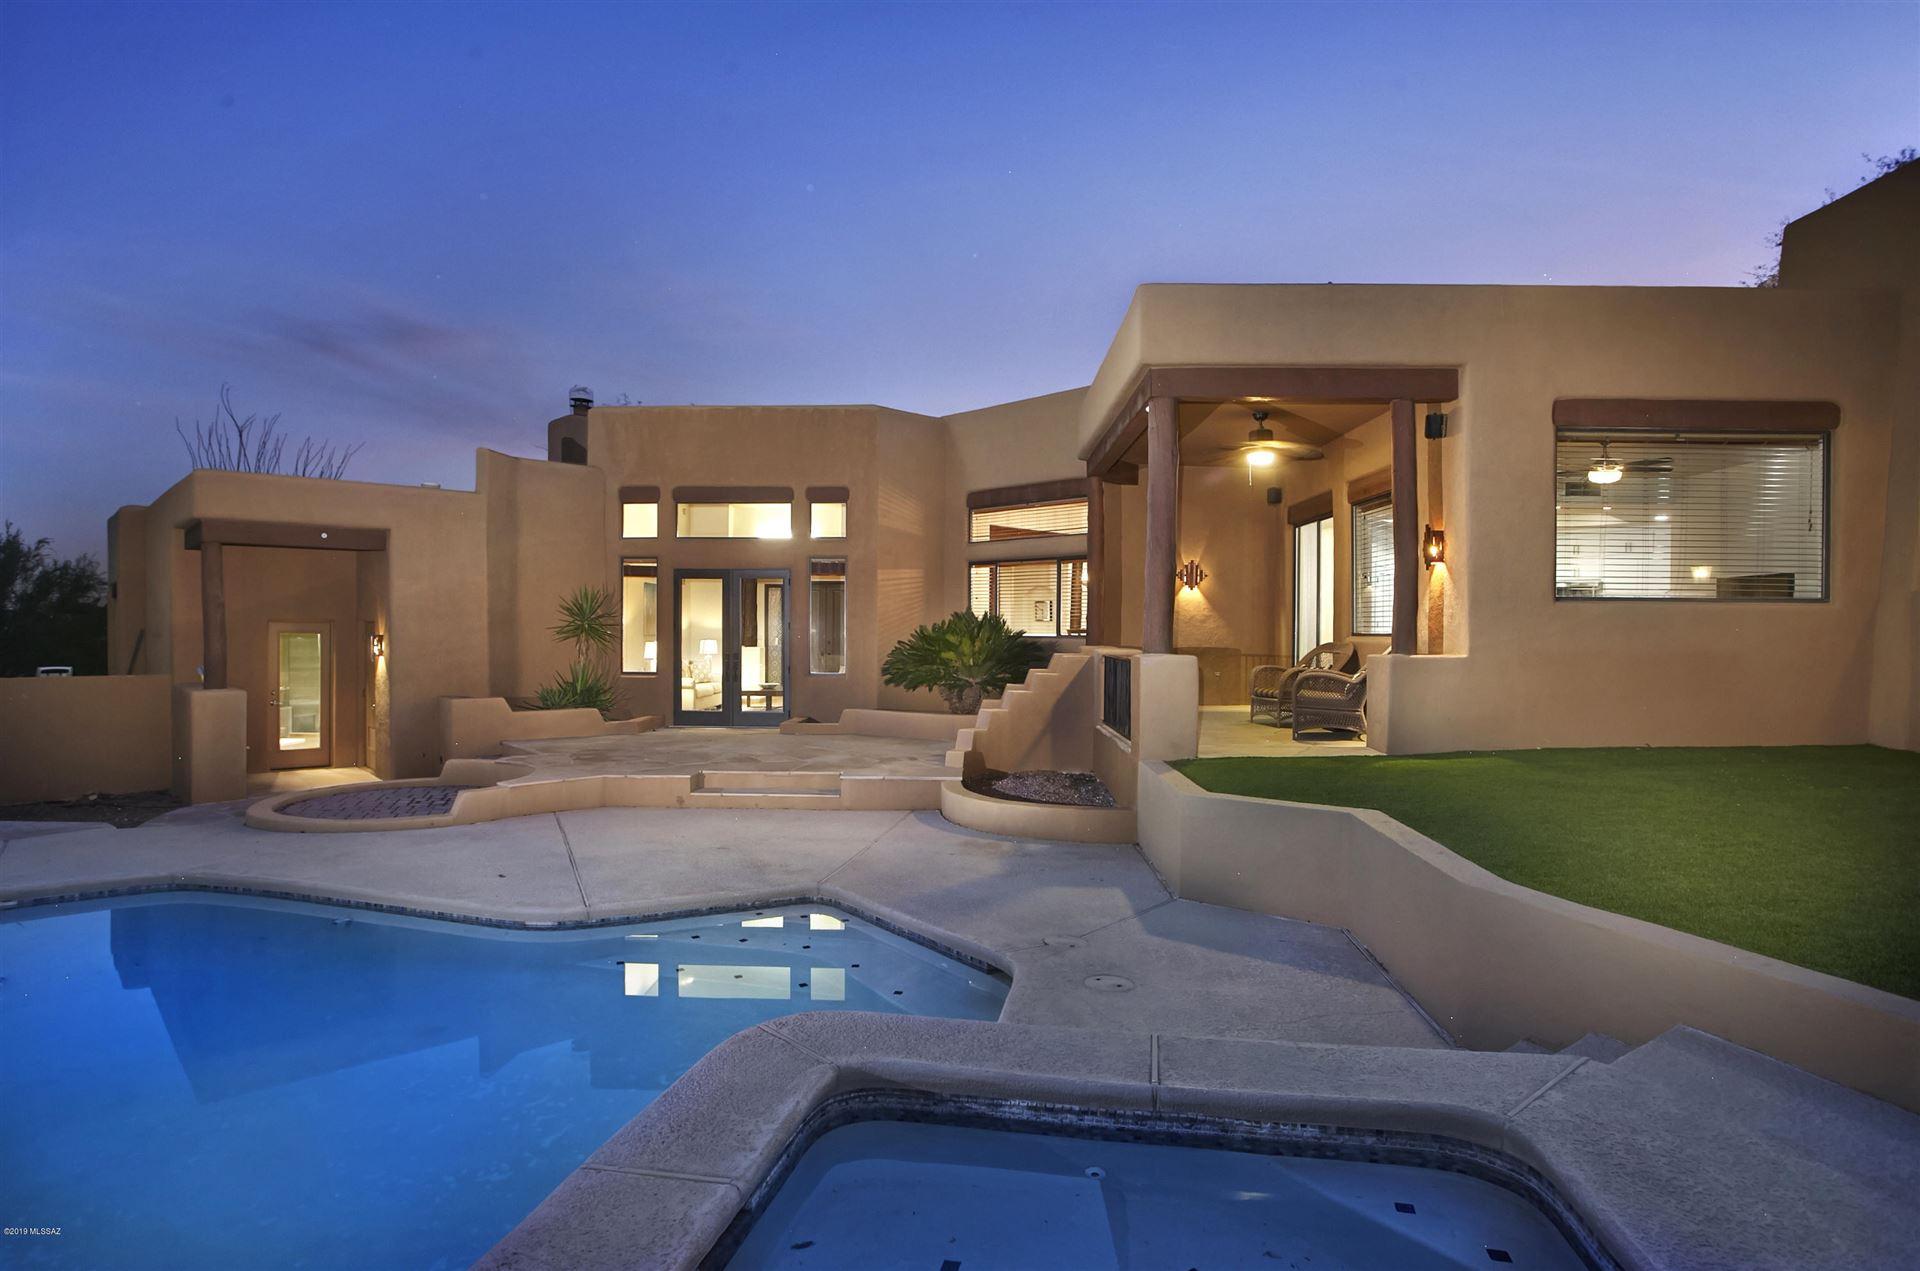 5110 N Ave De Castilla, Tucson, AZ 85718 - MLS#: 22021596